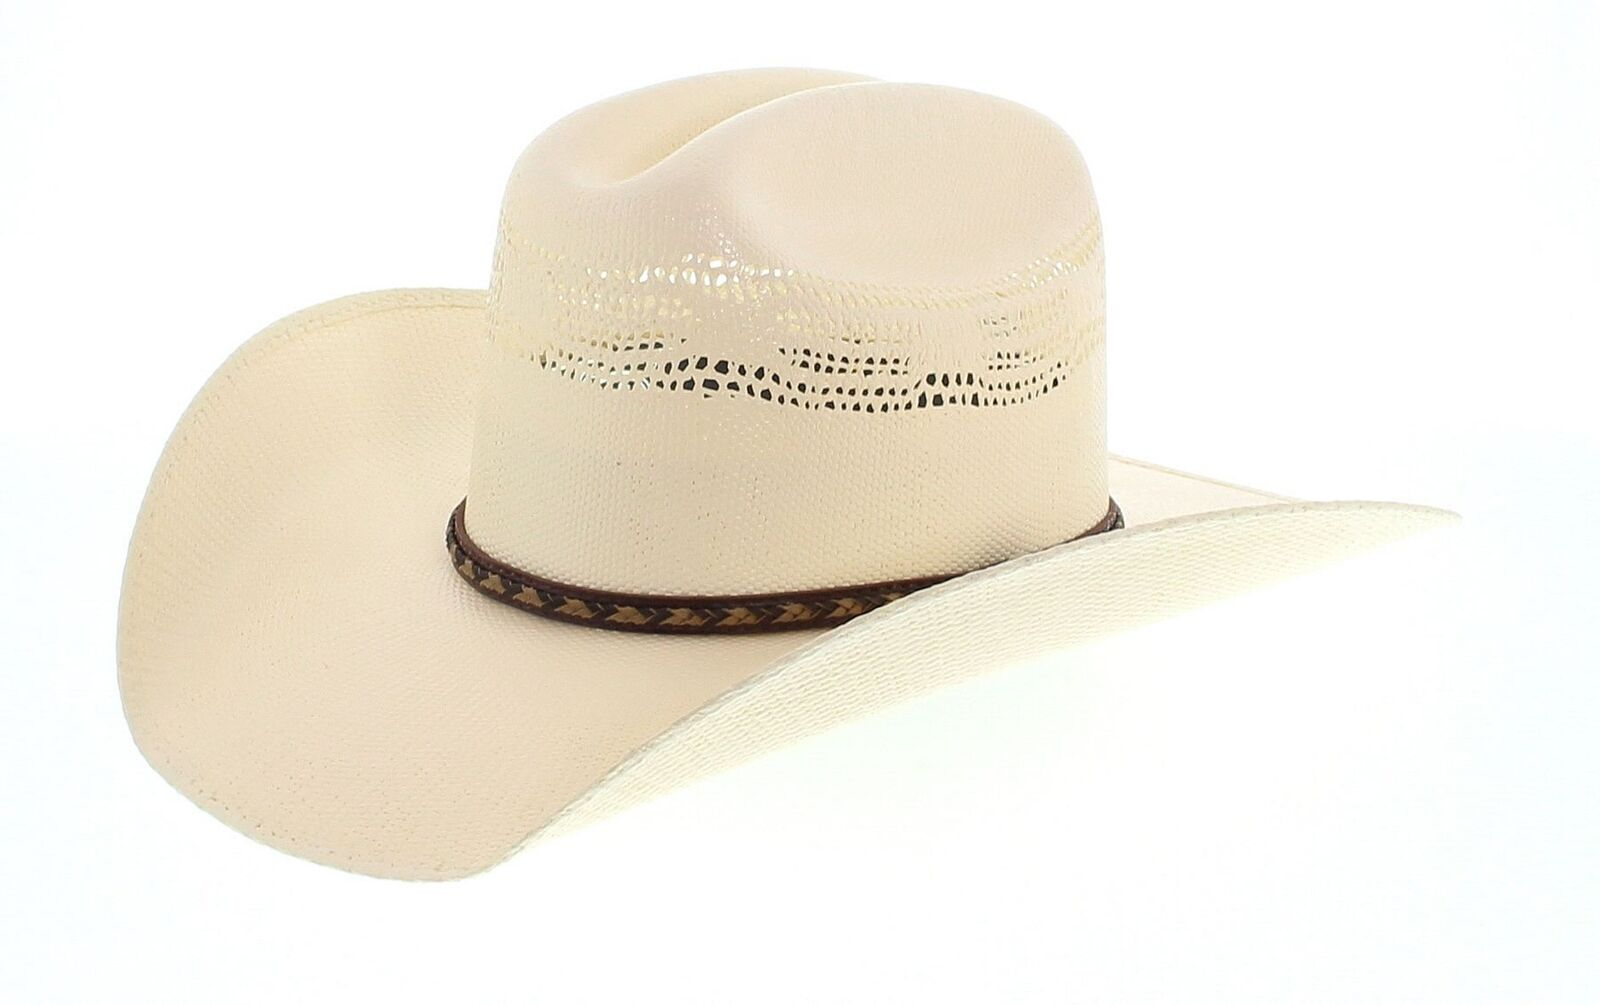 Justin Hats 20X BRYSON Herren Cowboyhut | Nicht so teuer  teuer  teuer  28a683